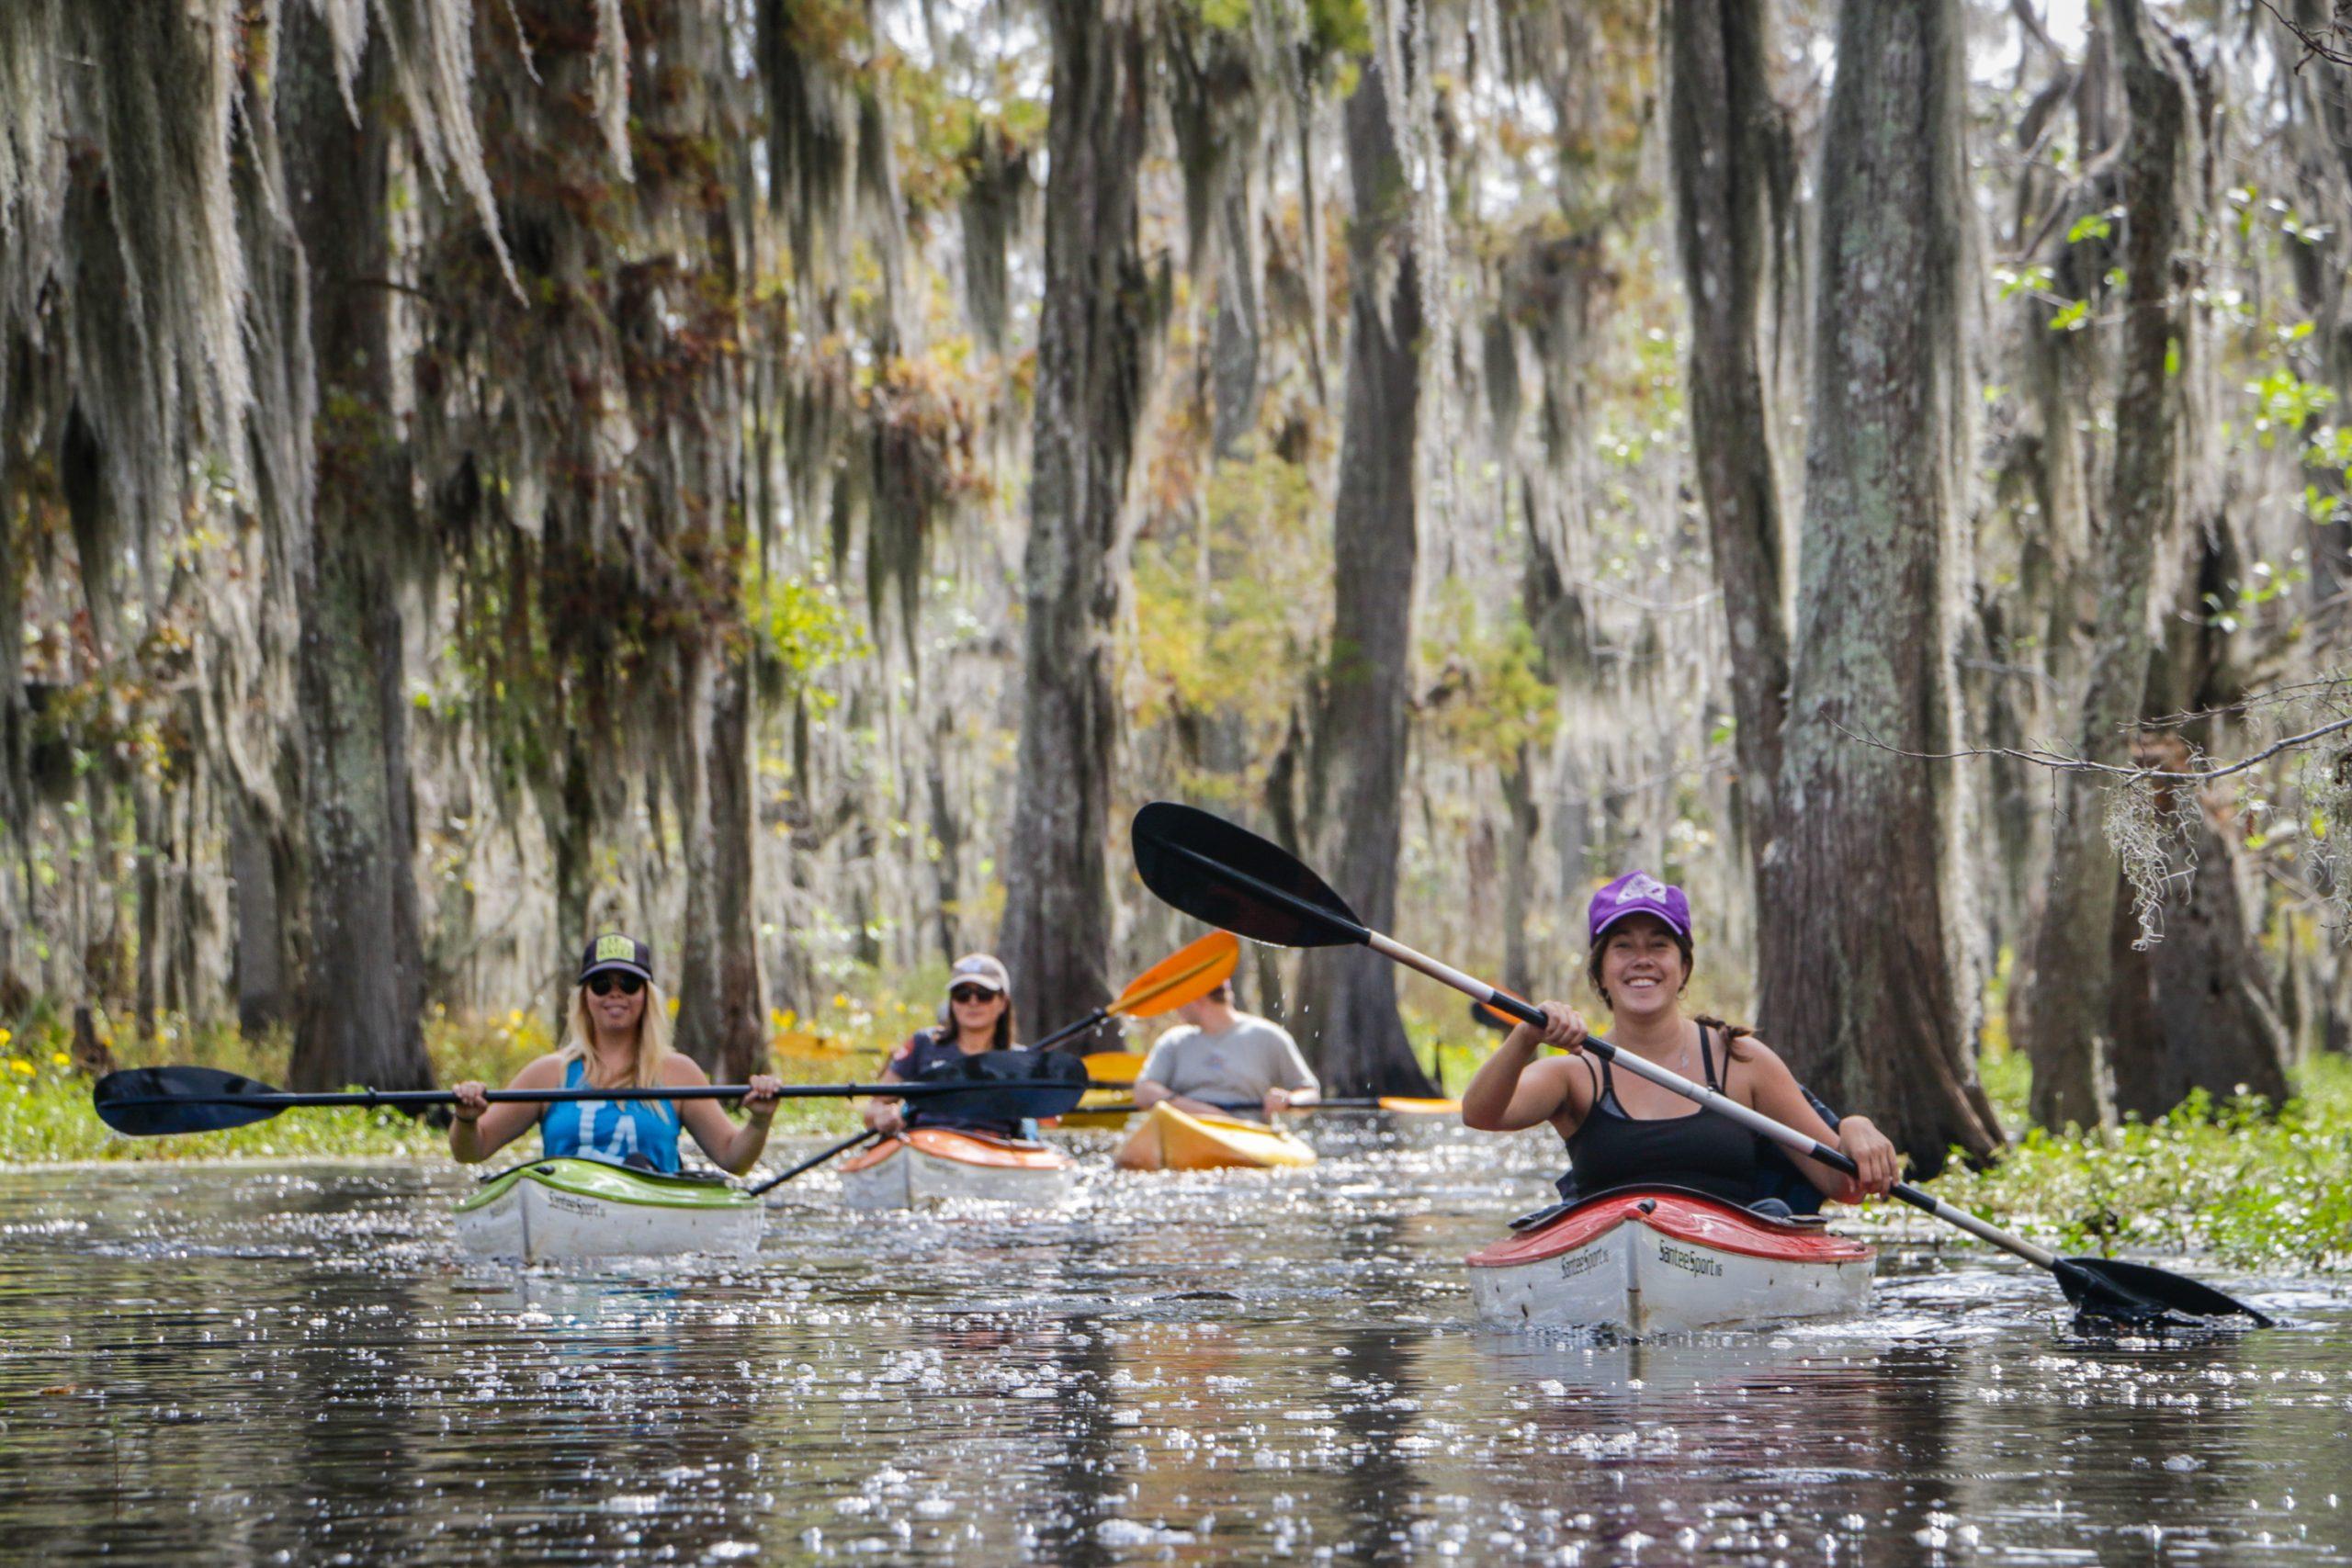 Top things to do in Louisiana